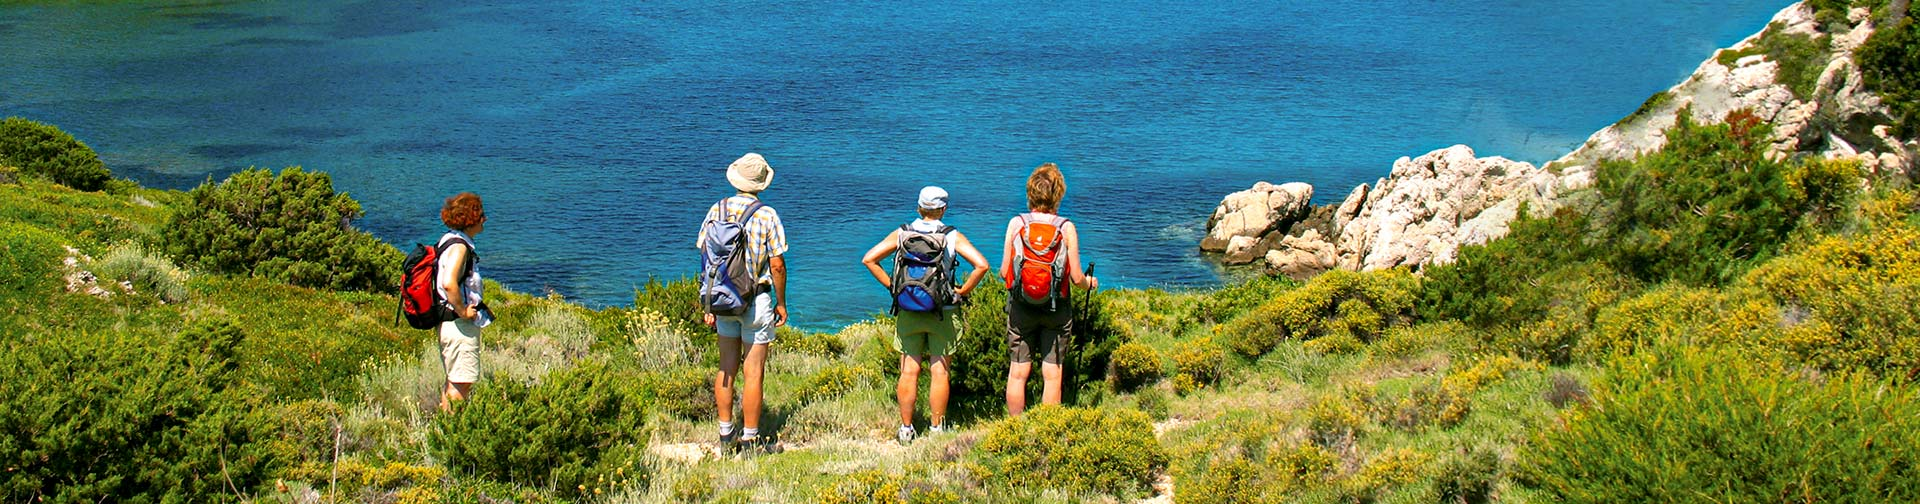 Wandern & Rad fahren auf Korfu | Korfu-Trail |Natur pur